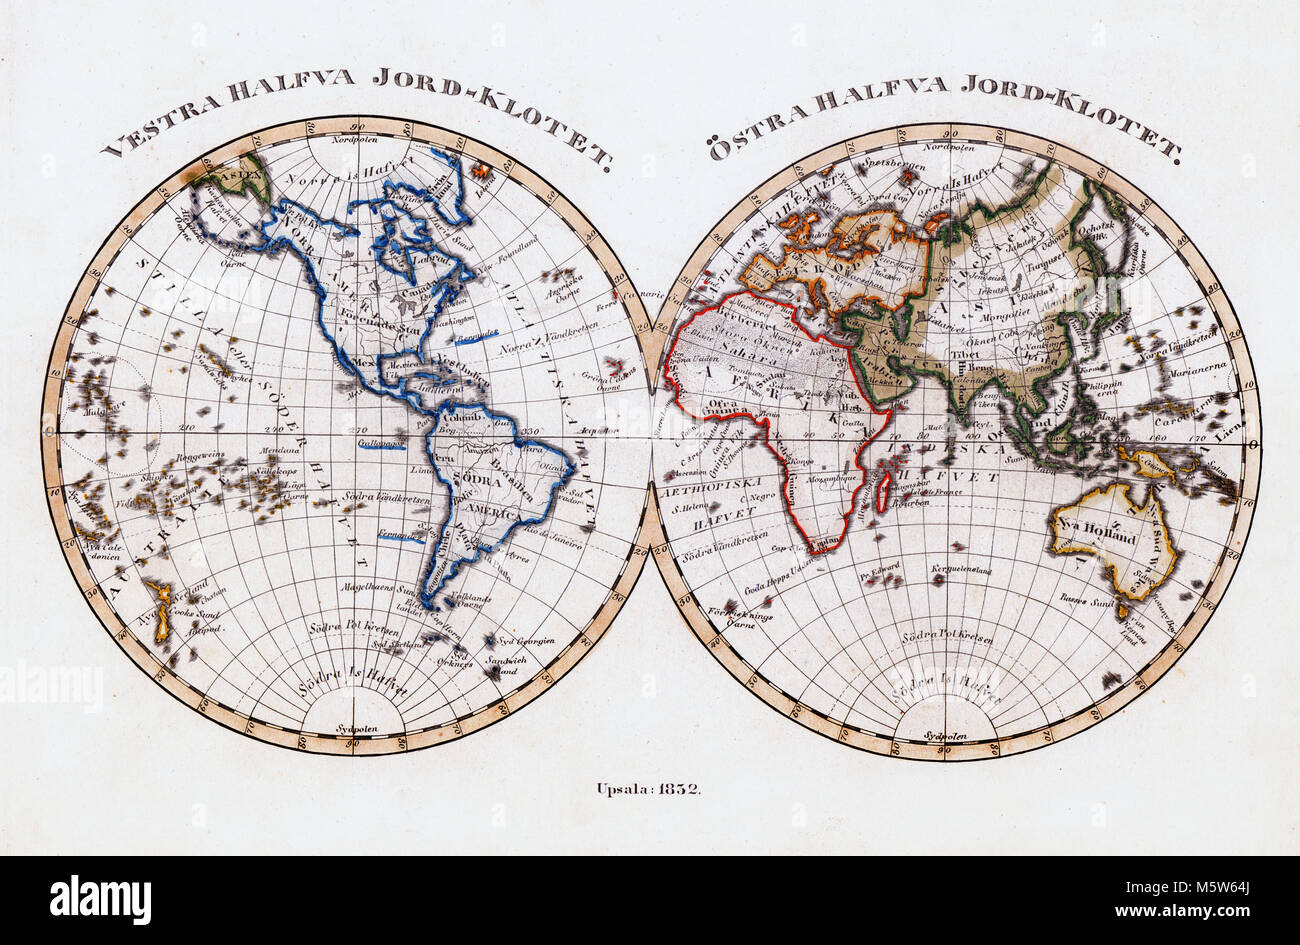 Australia And America Map.1844 Stieler Map World In Hemispheres Europe Africa Asia Stock